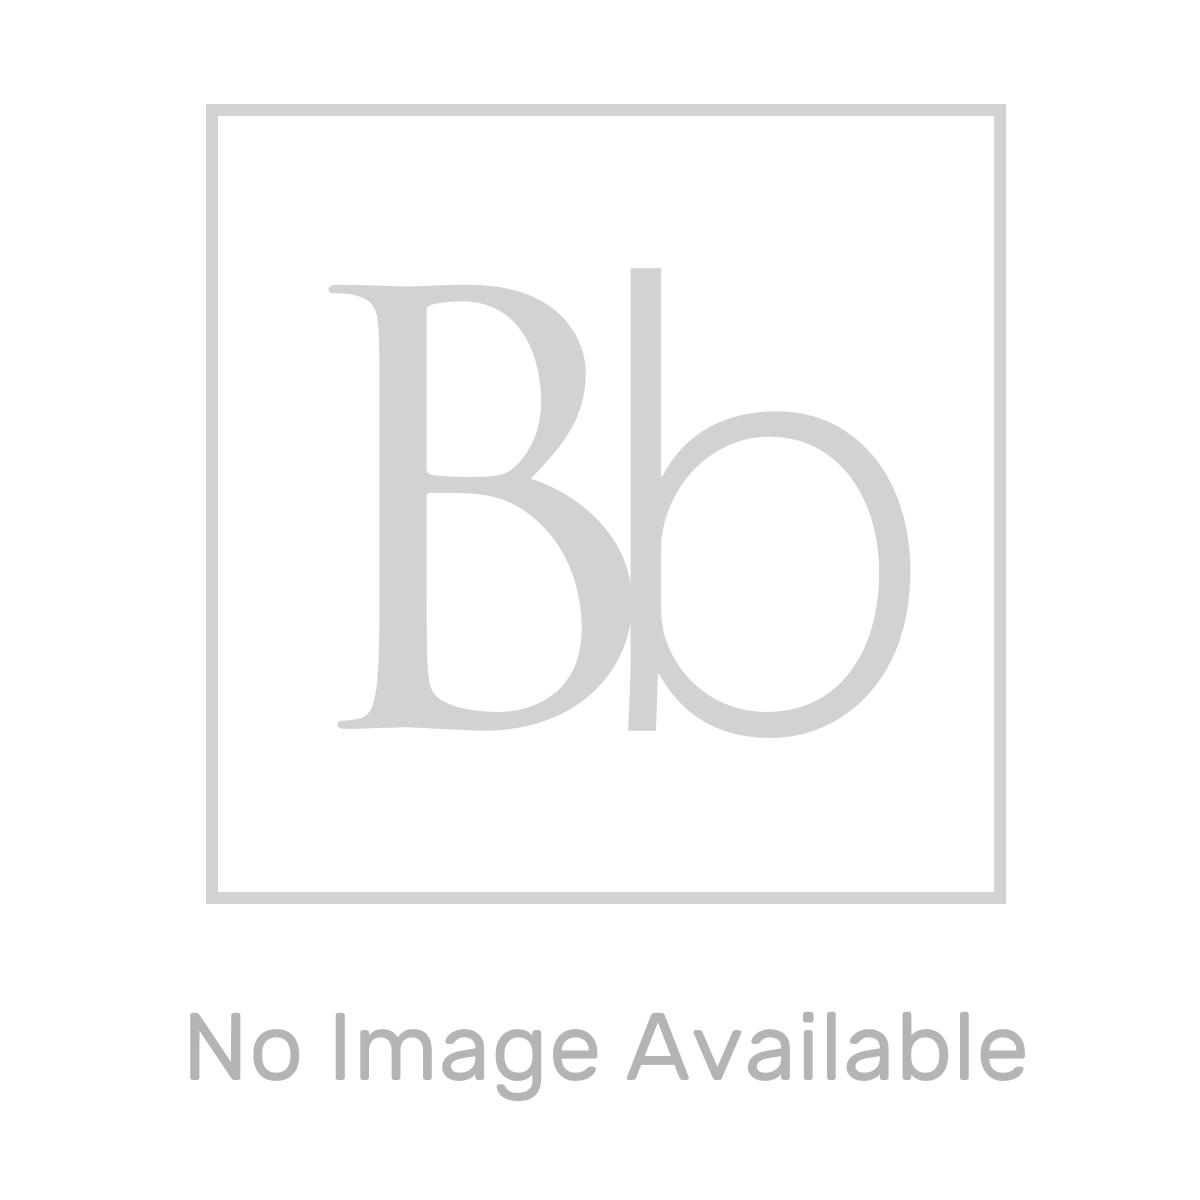 RAK Moon Black Toilet Brush with Holder Measurements